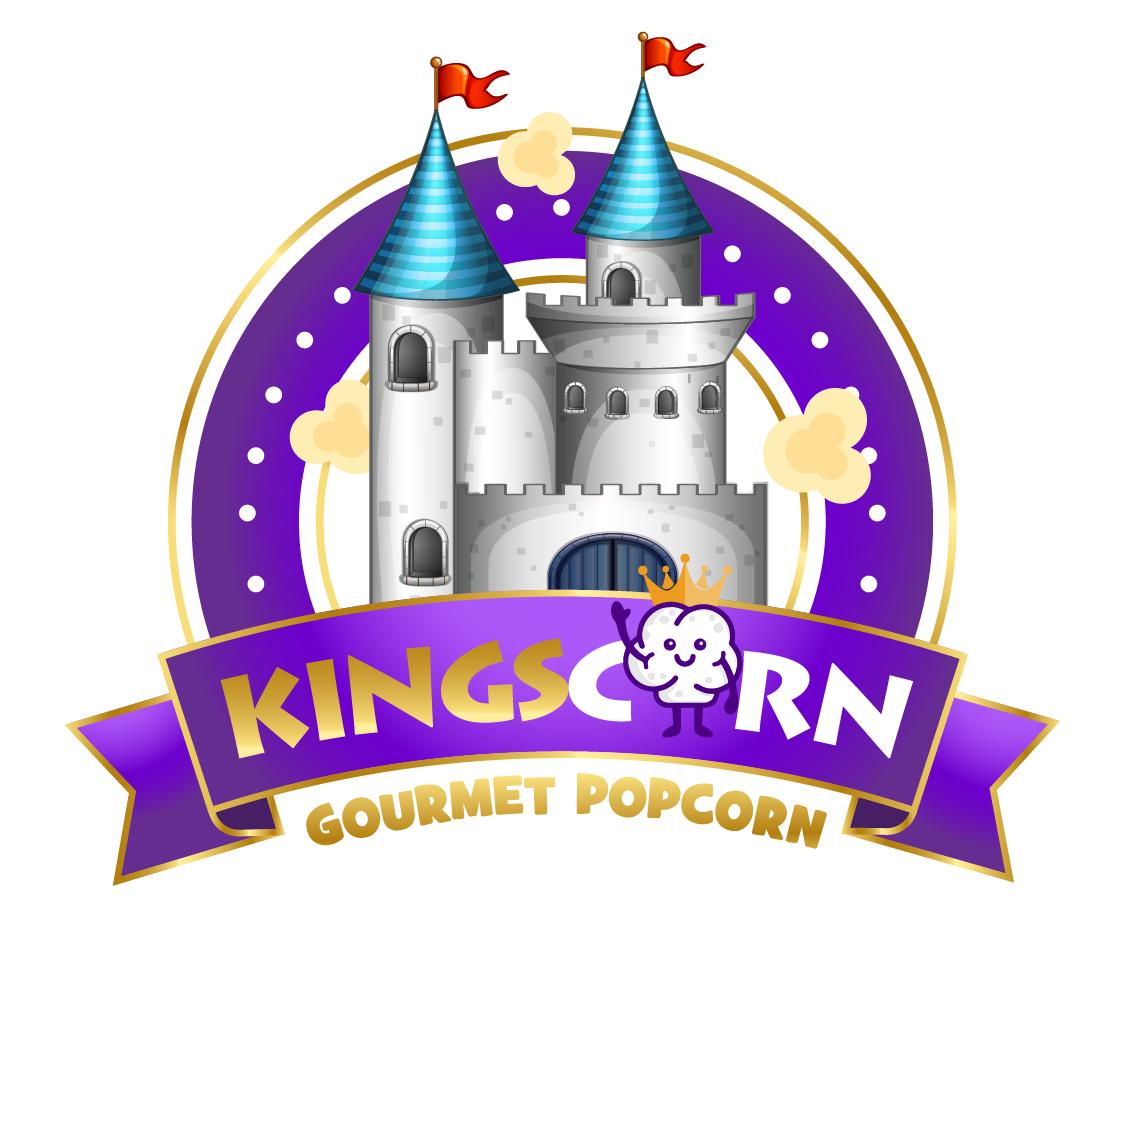 Kingscorn Gourmet Popcorn